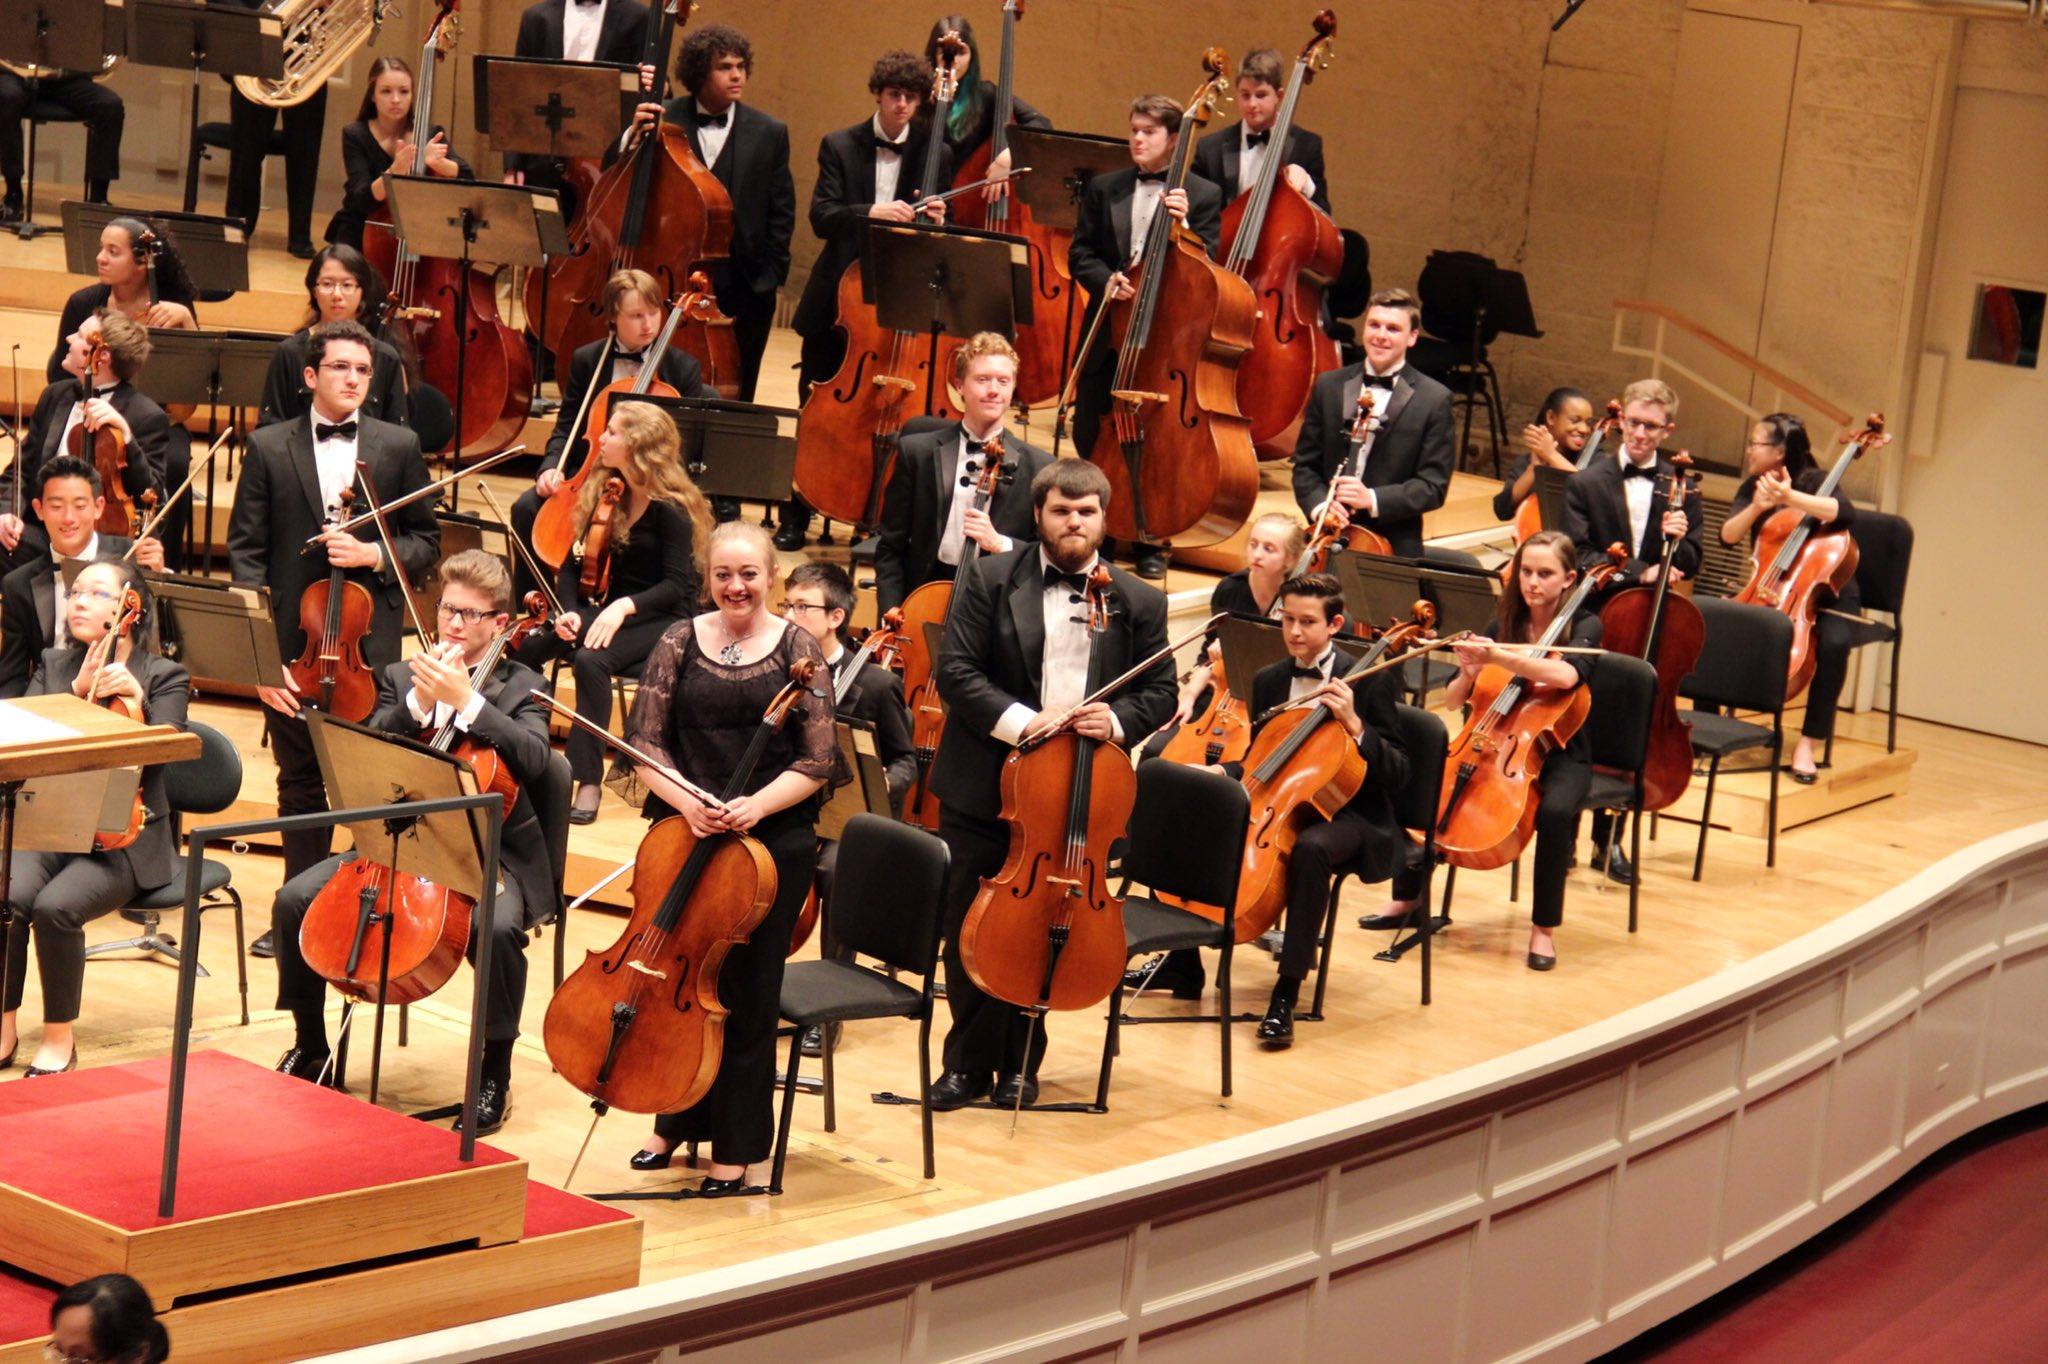 We salute @ChiYSO senior cellists T. Edwards, L. Morgan & A. Smerz. Incredible musicianship. #WeAreDGN #99Learns https://t.co/XtSsaAxKOm